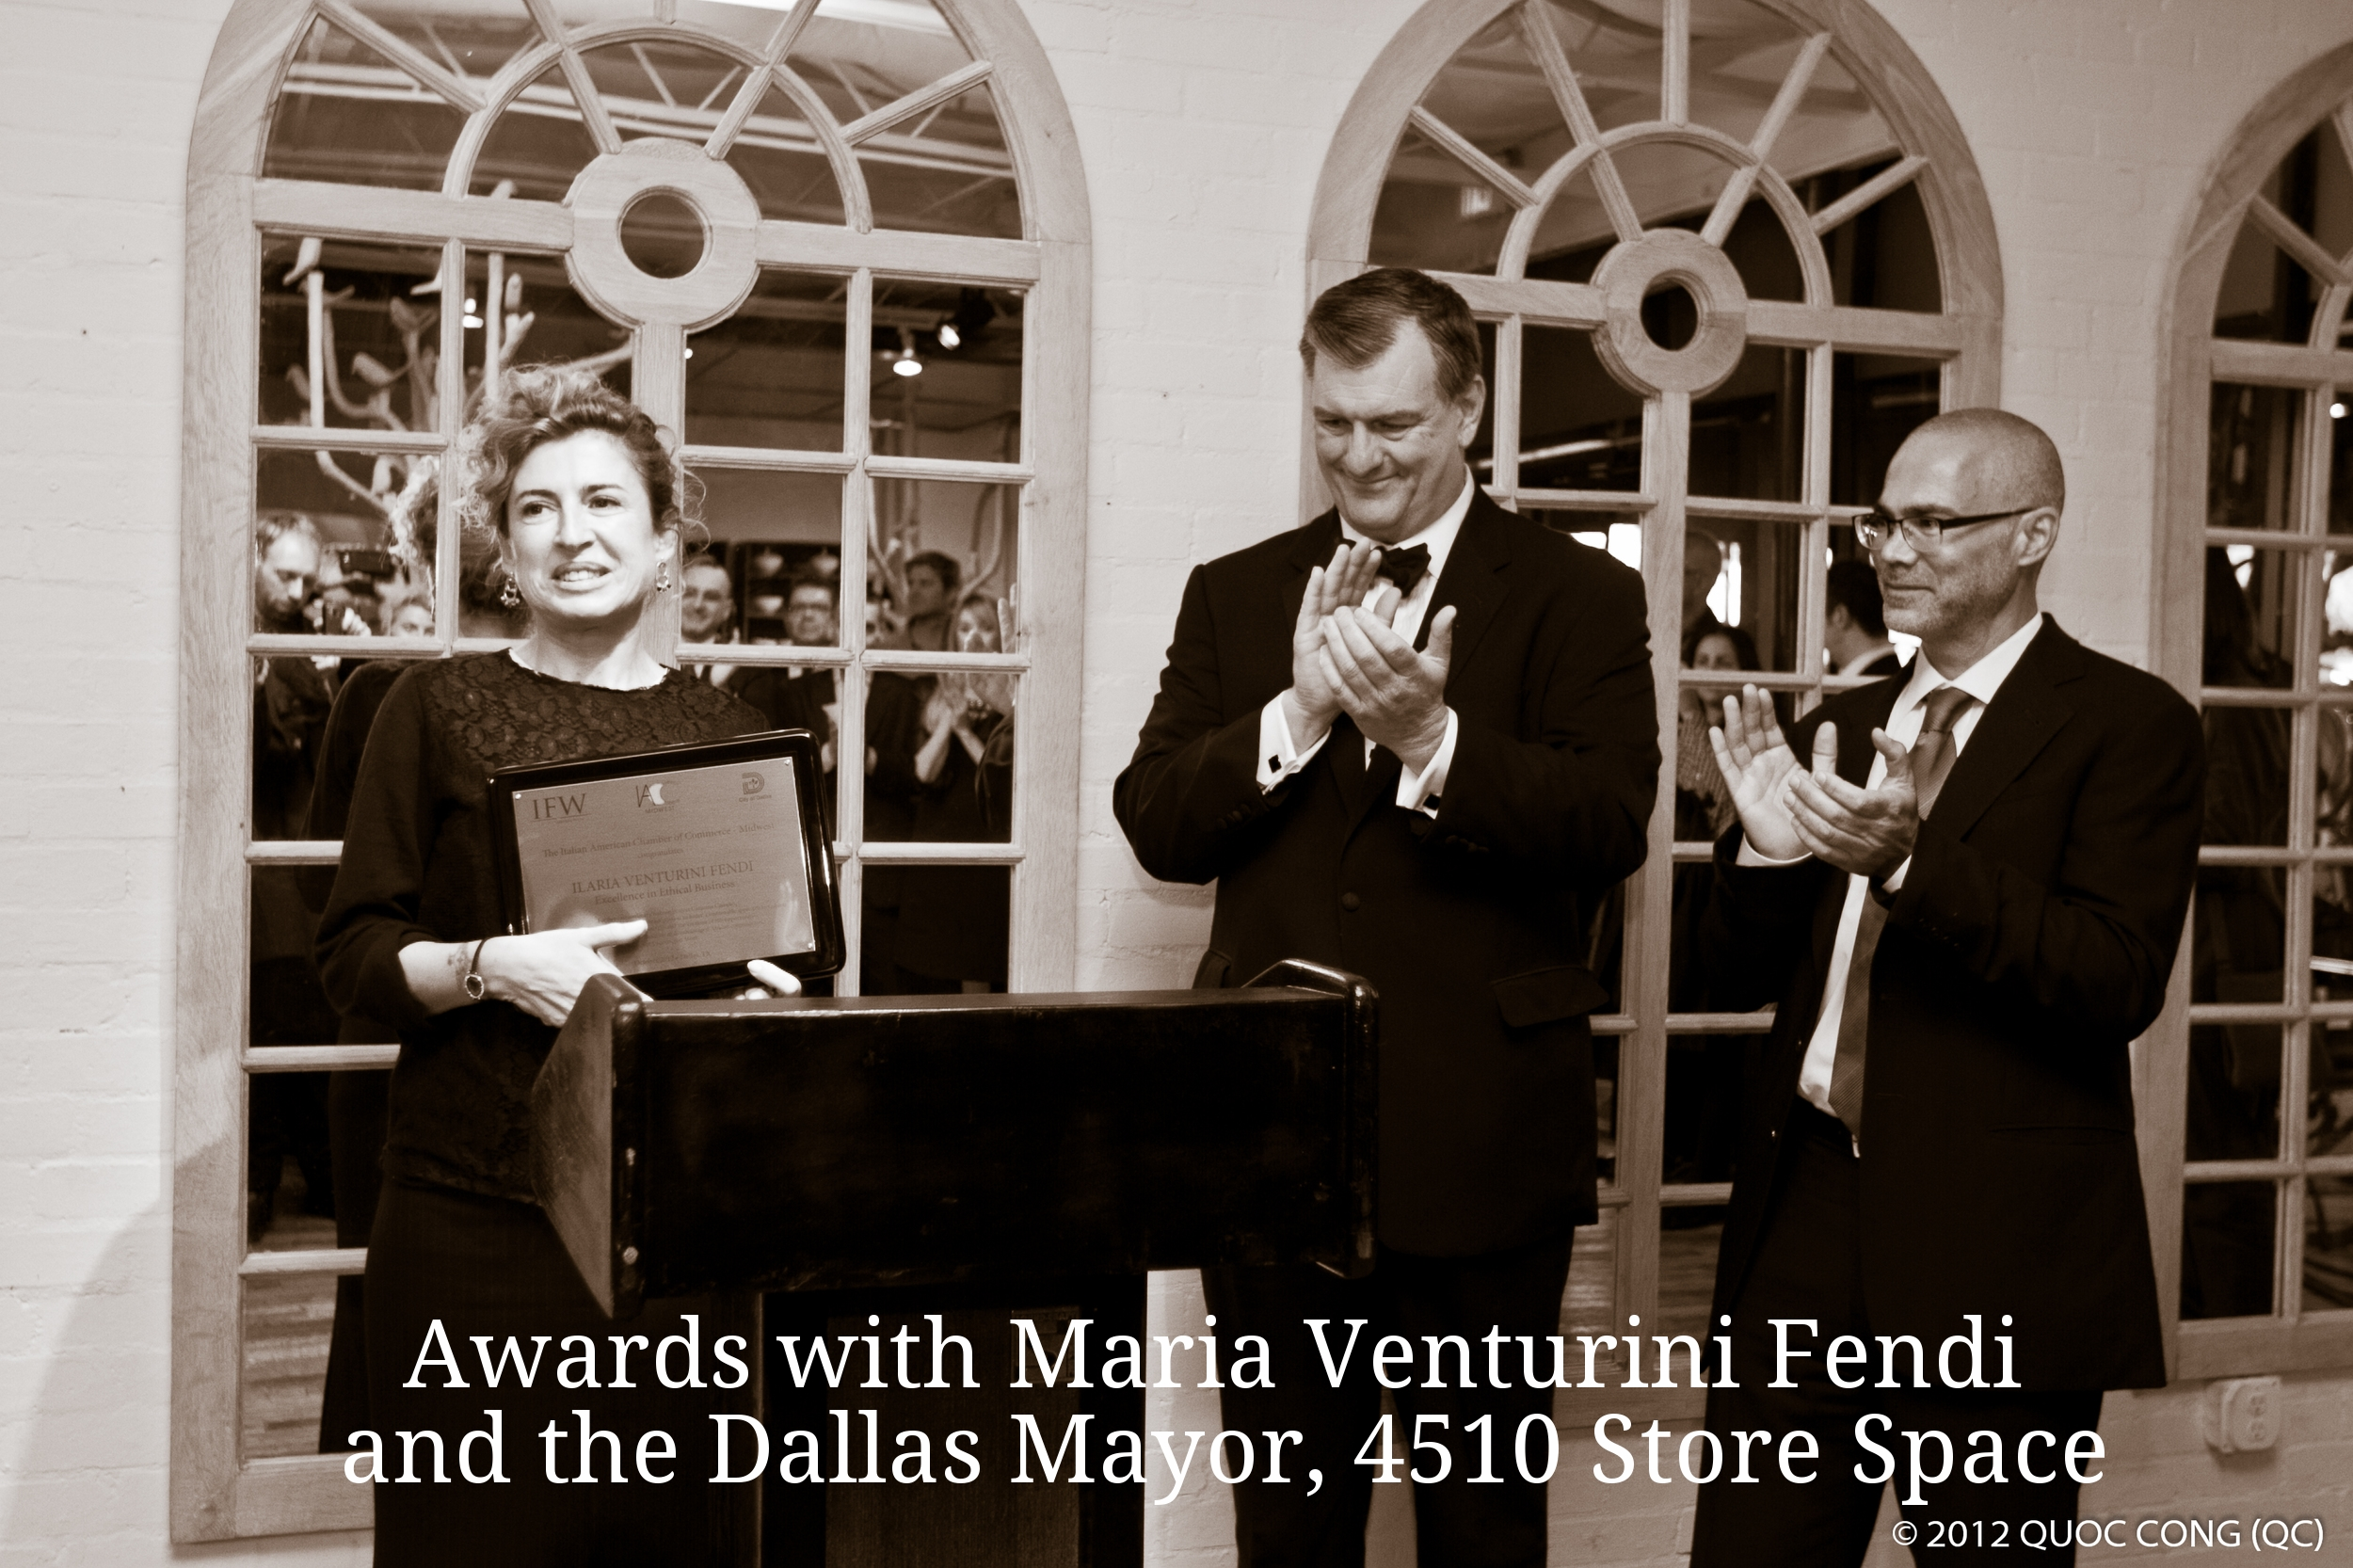 Awards_MariaVenturiniFendi_DallasMayor_4510 StoreSpace.JPG